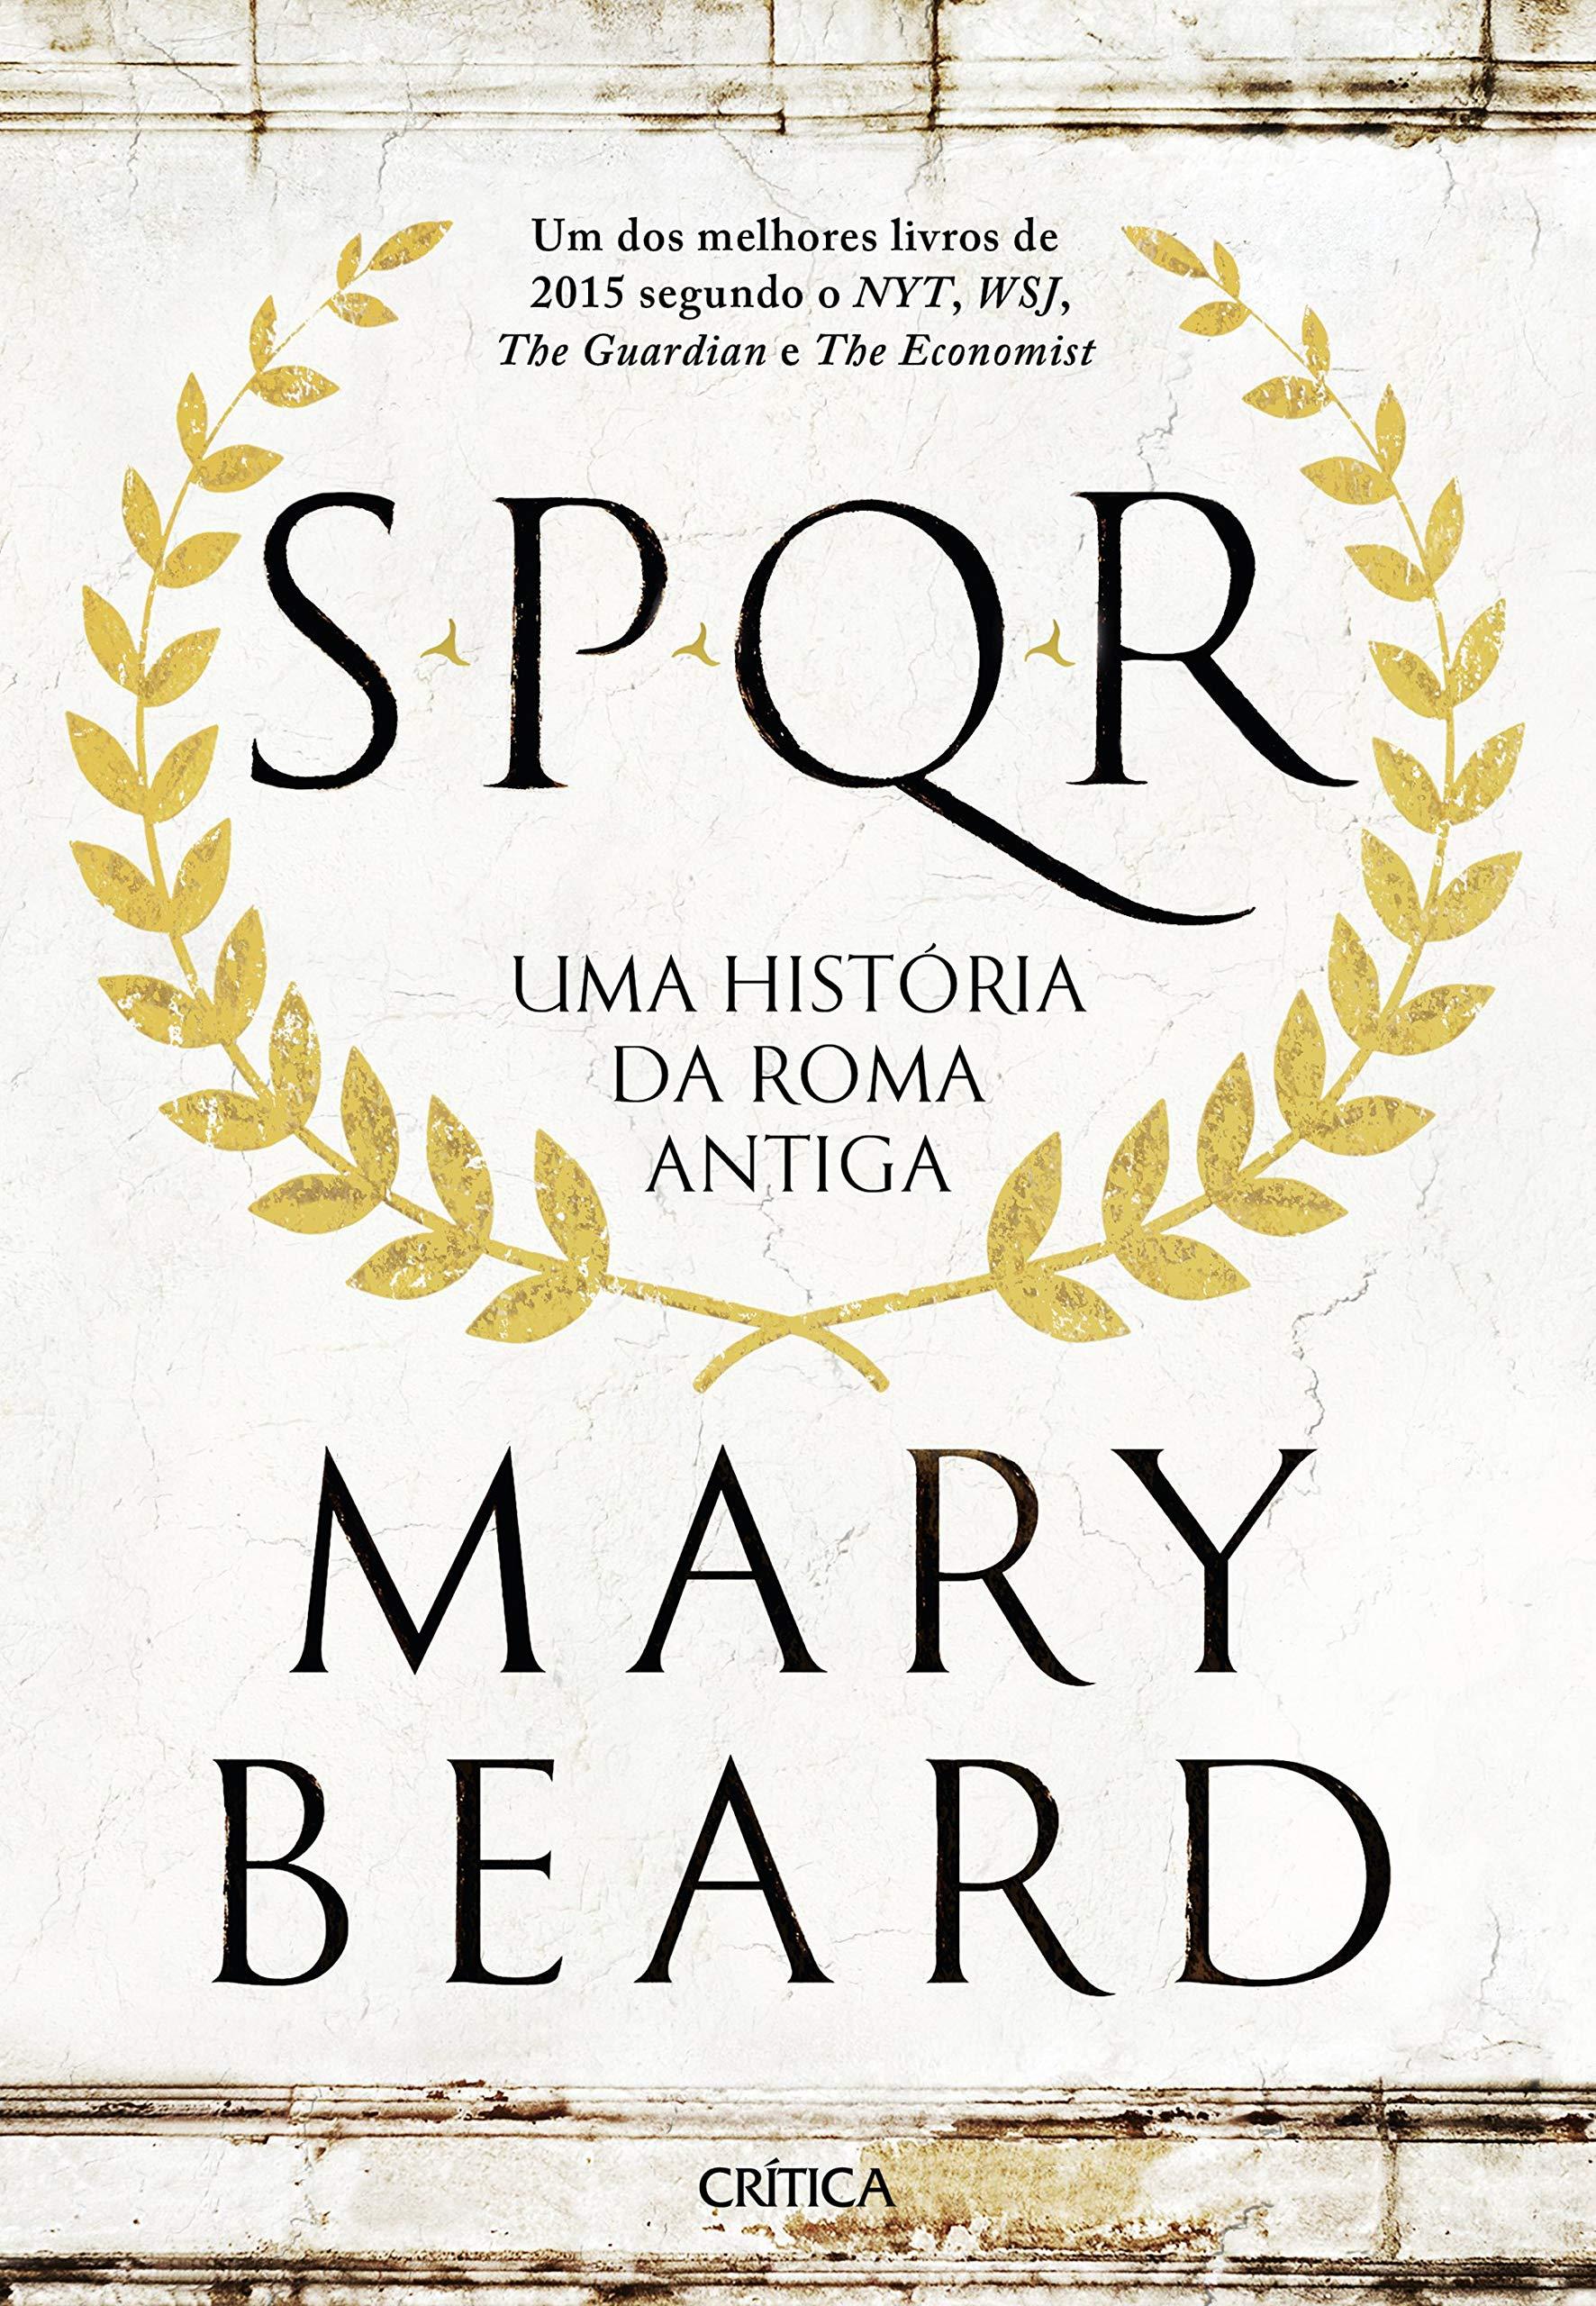 SPQR - Uma história da Roma antiga — Mary Beard